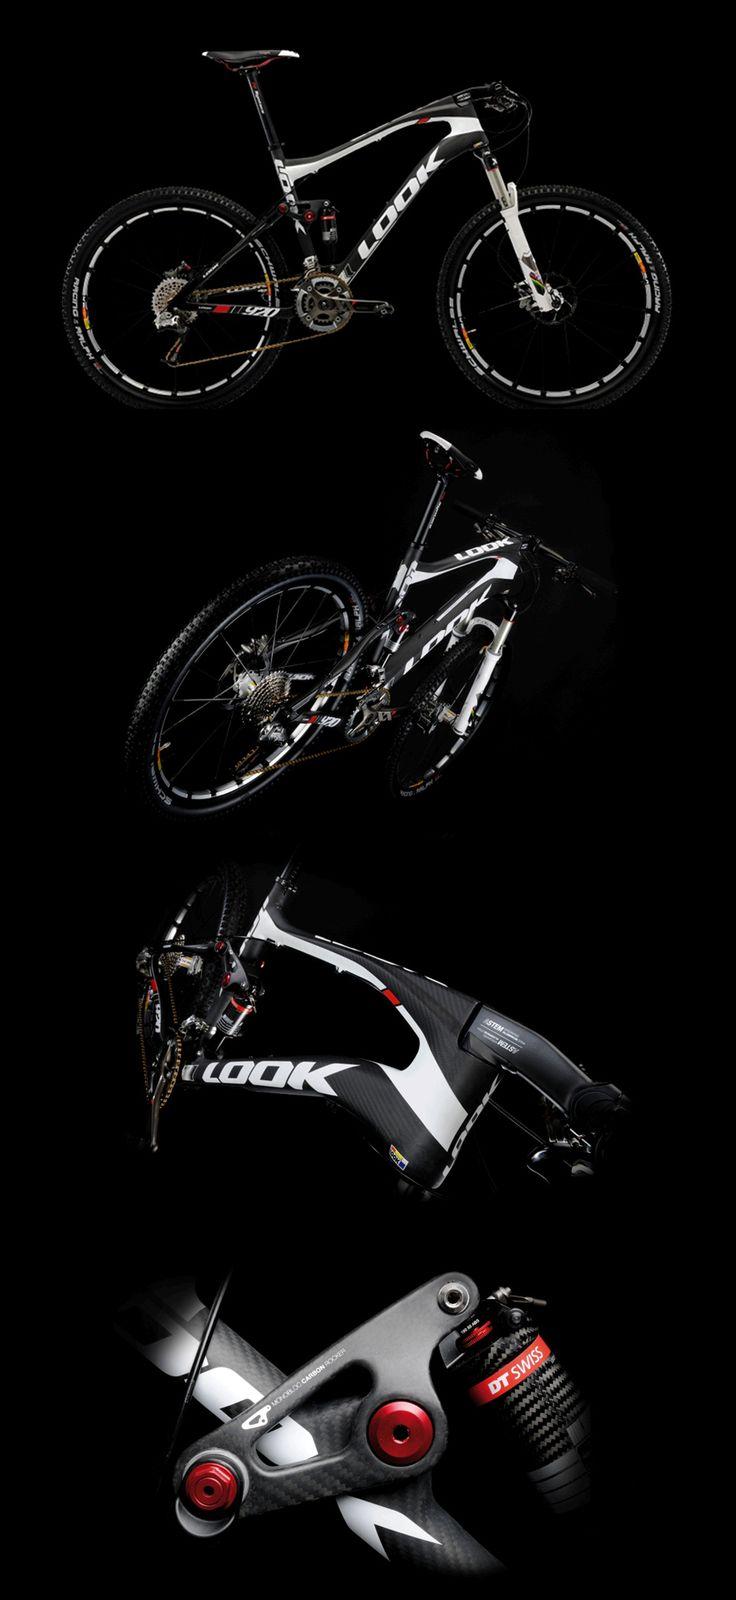 #LL @lufelive #mountainbiking #MTB Look 920 Carbon Kit mountain bike